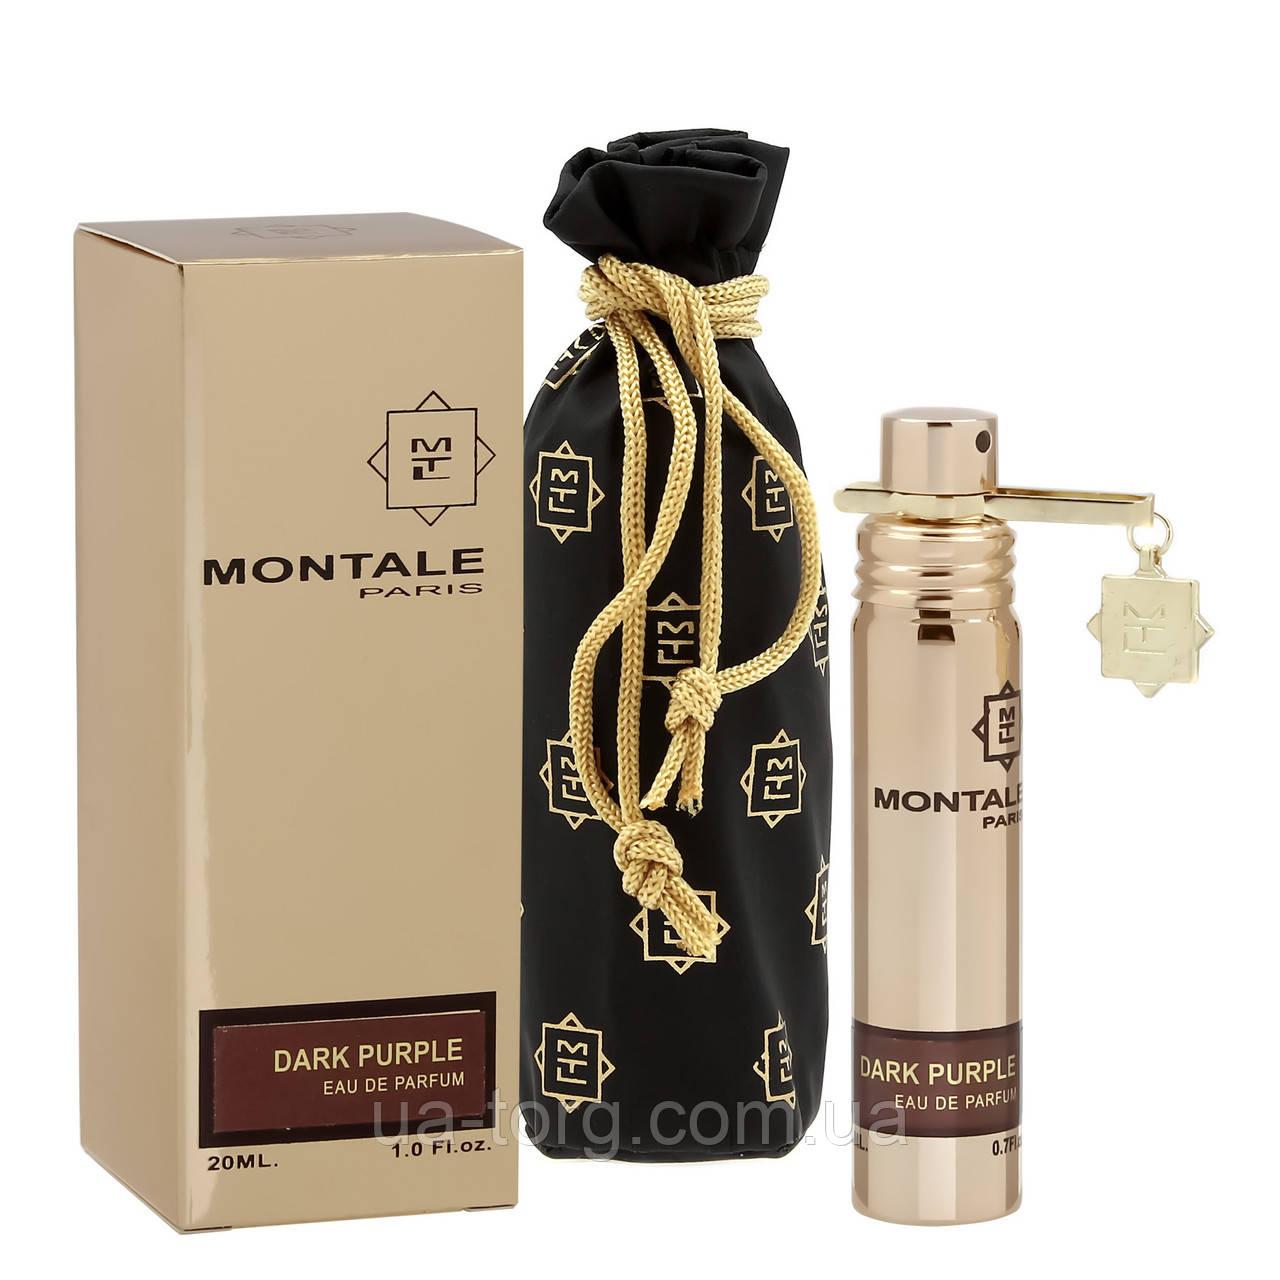 Унисекс мини-парфюм с феромонами Montale Dark Purple (Темно-фиолетовый)  20 мл